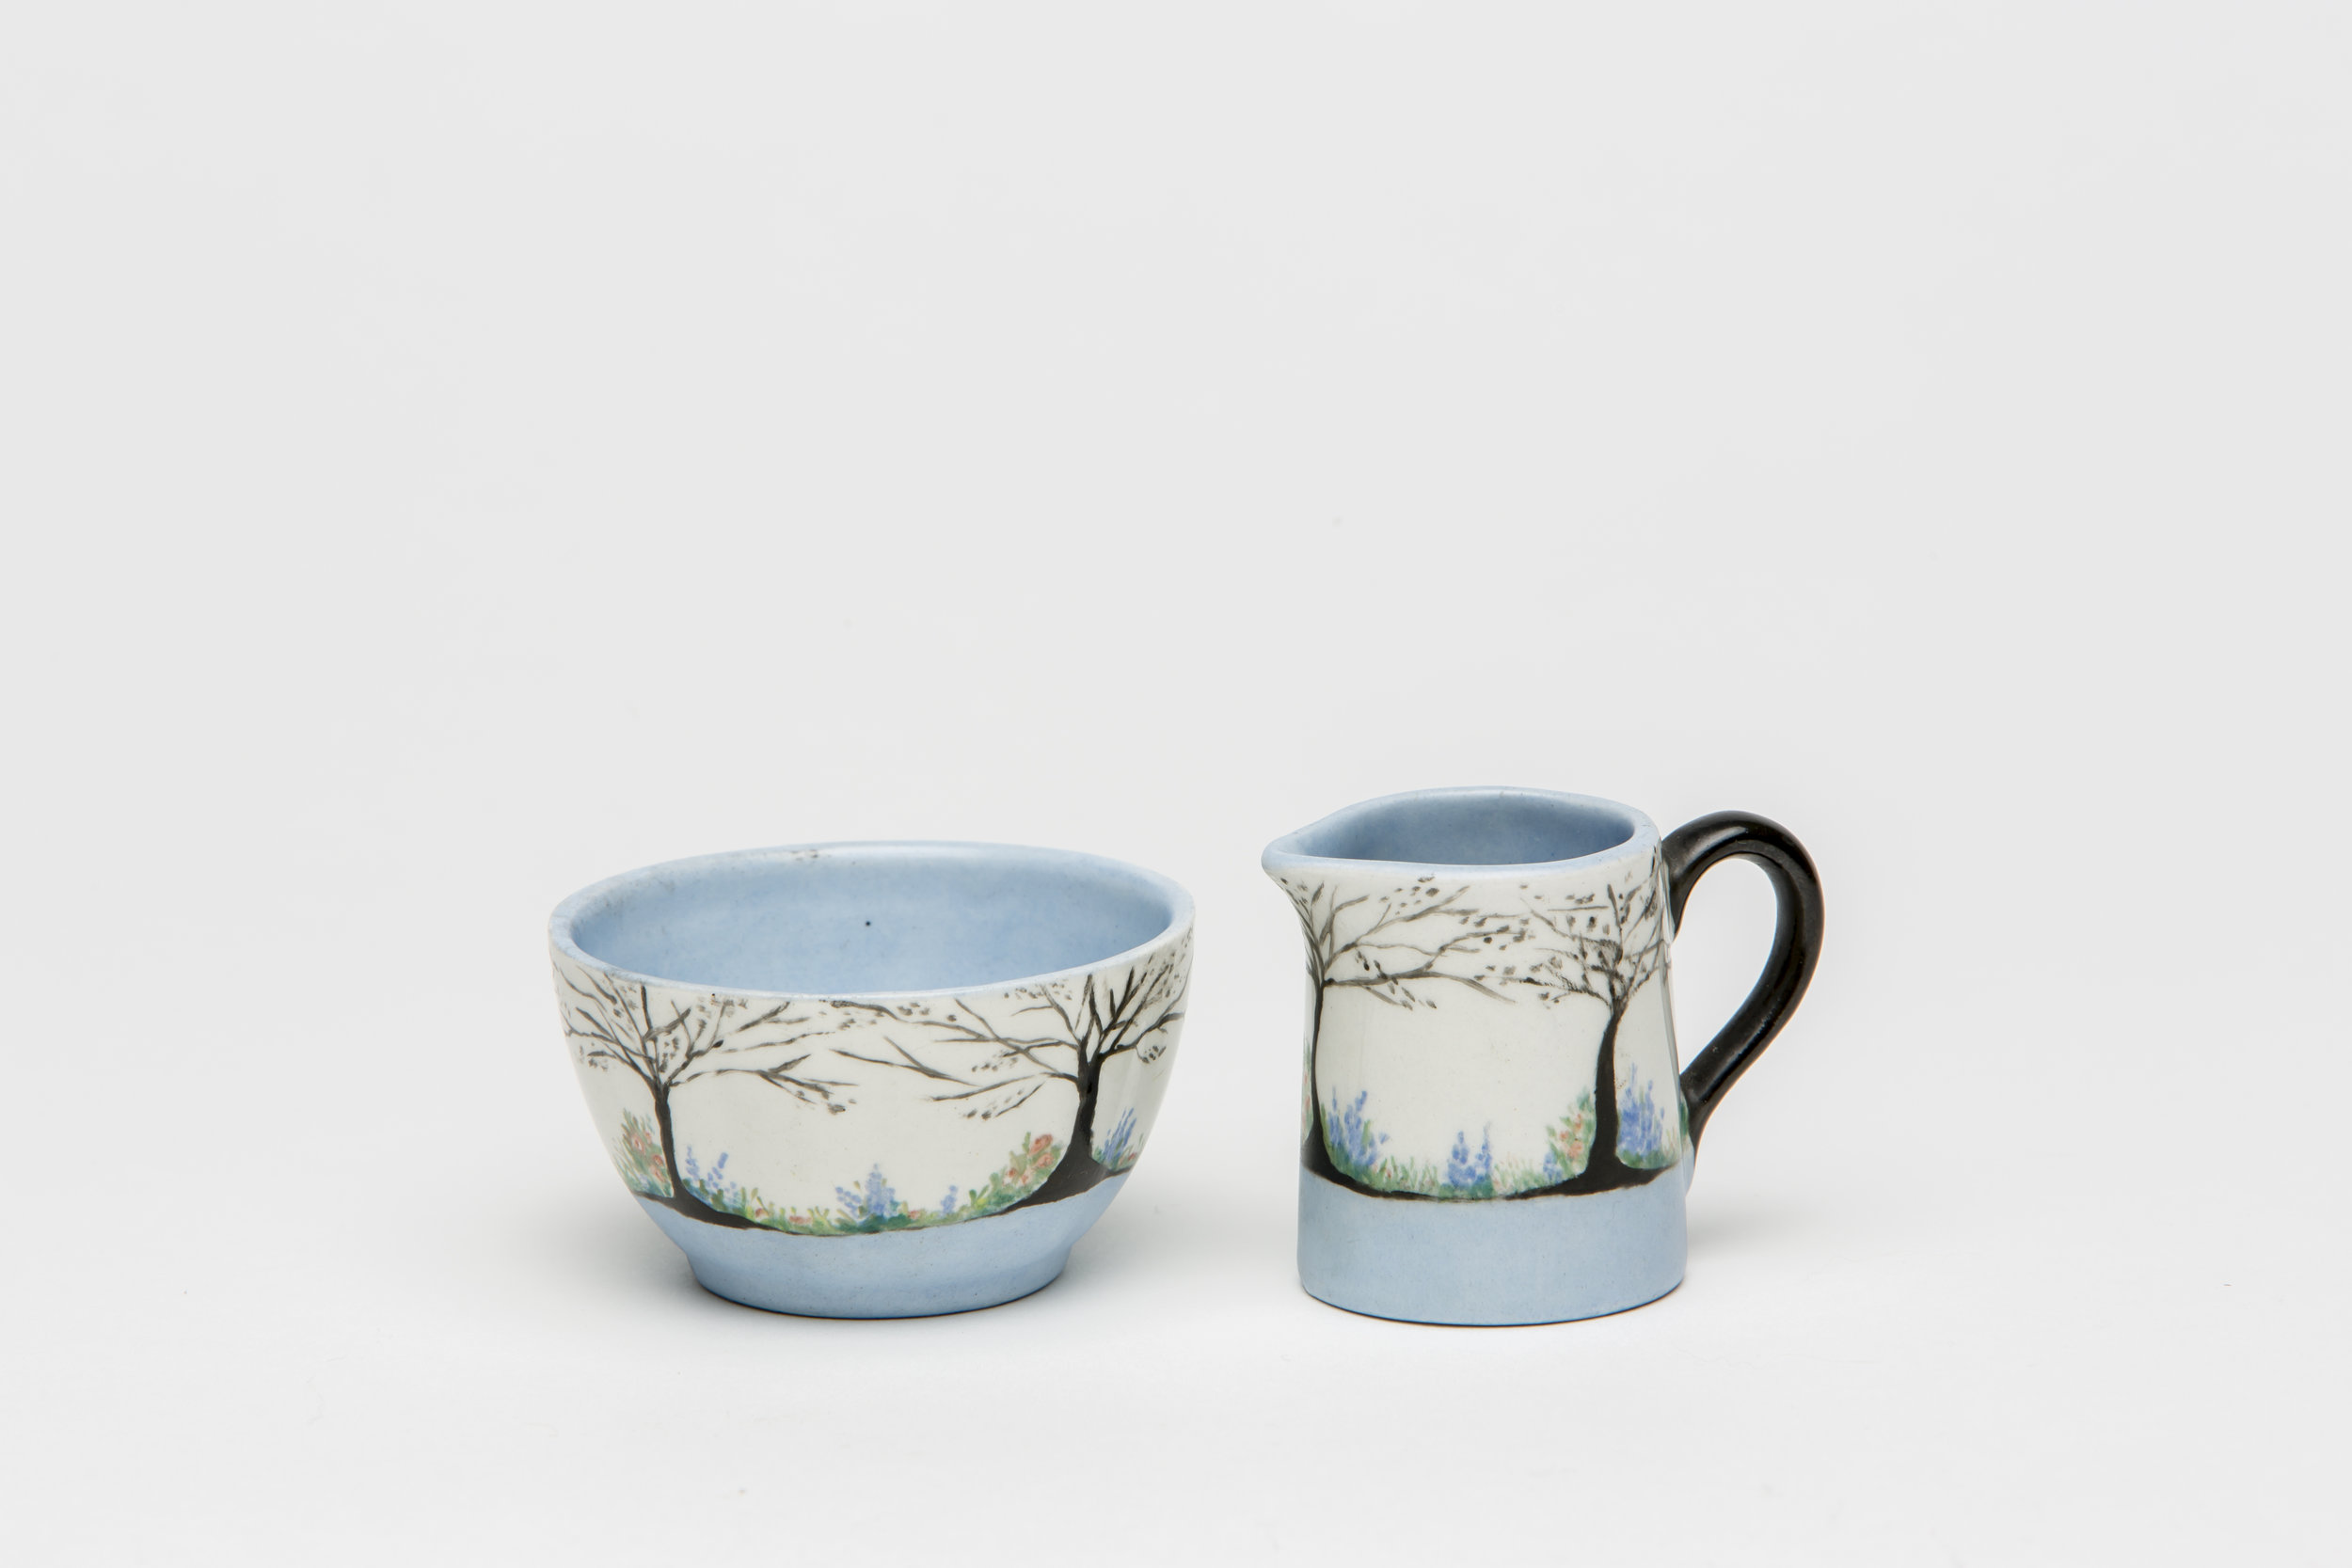 Jessie MacDonald, white and black designed china painted sugar jug and bowl, c. 1928. Jug: 4.9x4cm; Bowl: 3.8x6.5cm. Photograph by Sam Roberts.